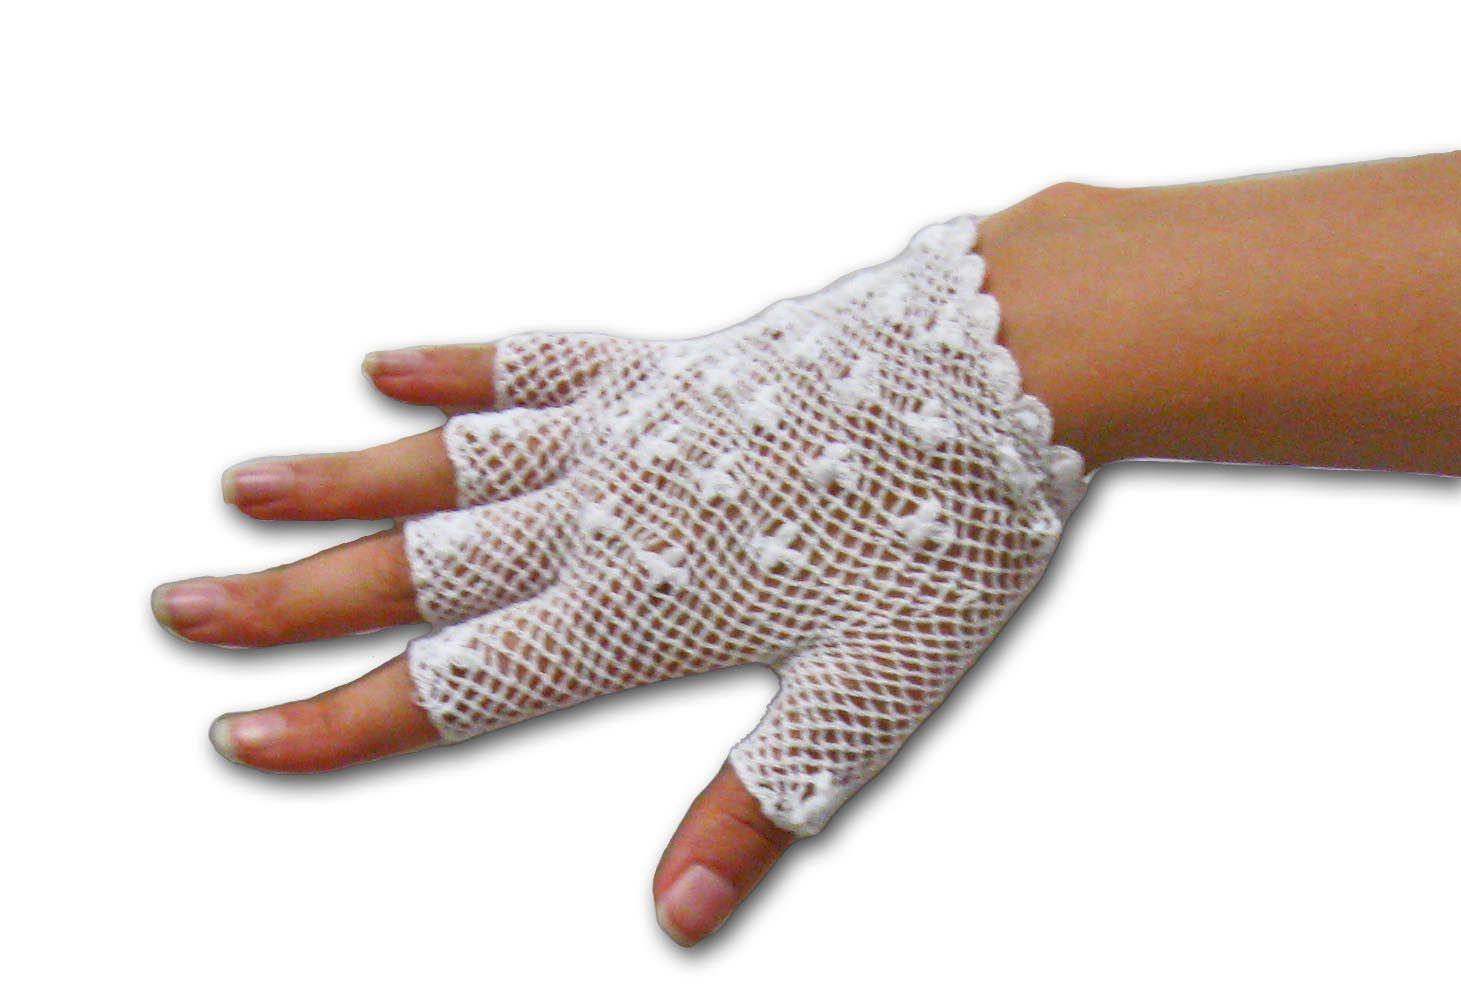 Crochet+Gloves+with+Fingers | Crochet Lace Gloves - Free Crochet ...